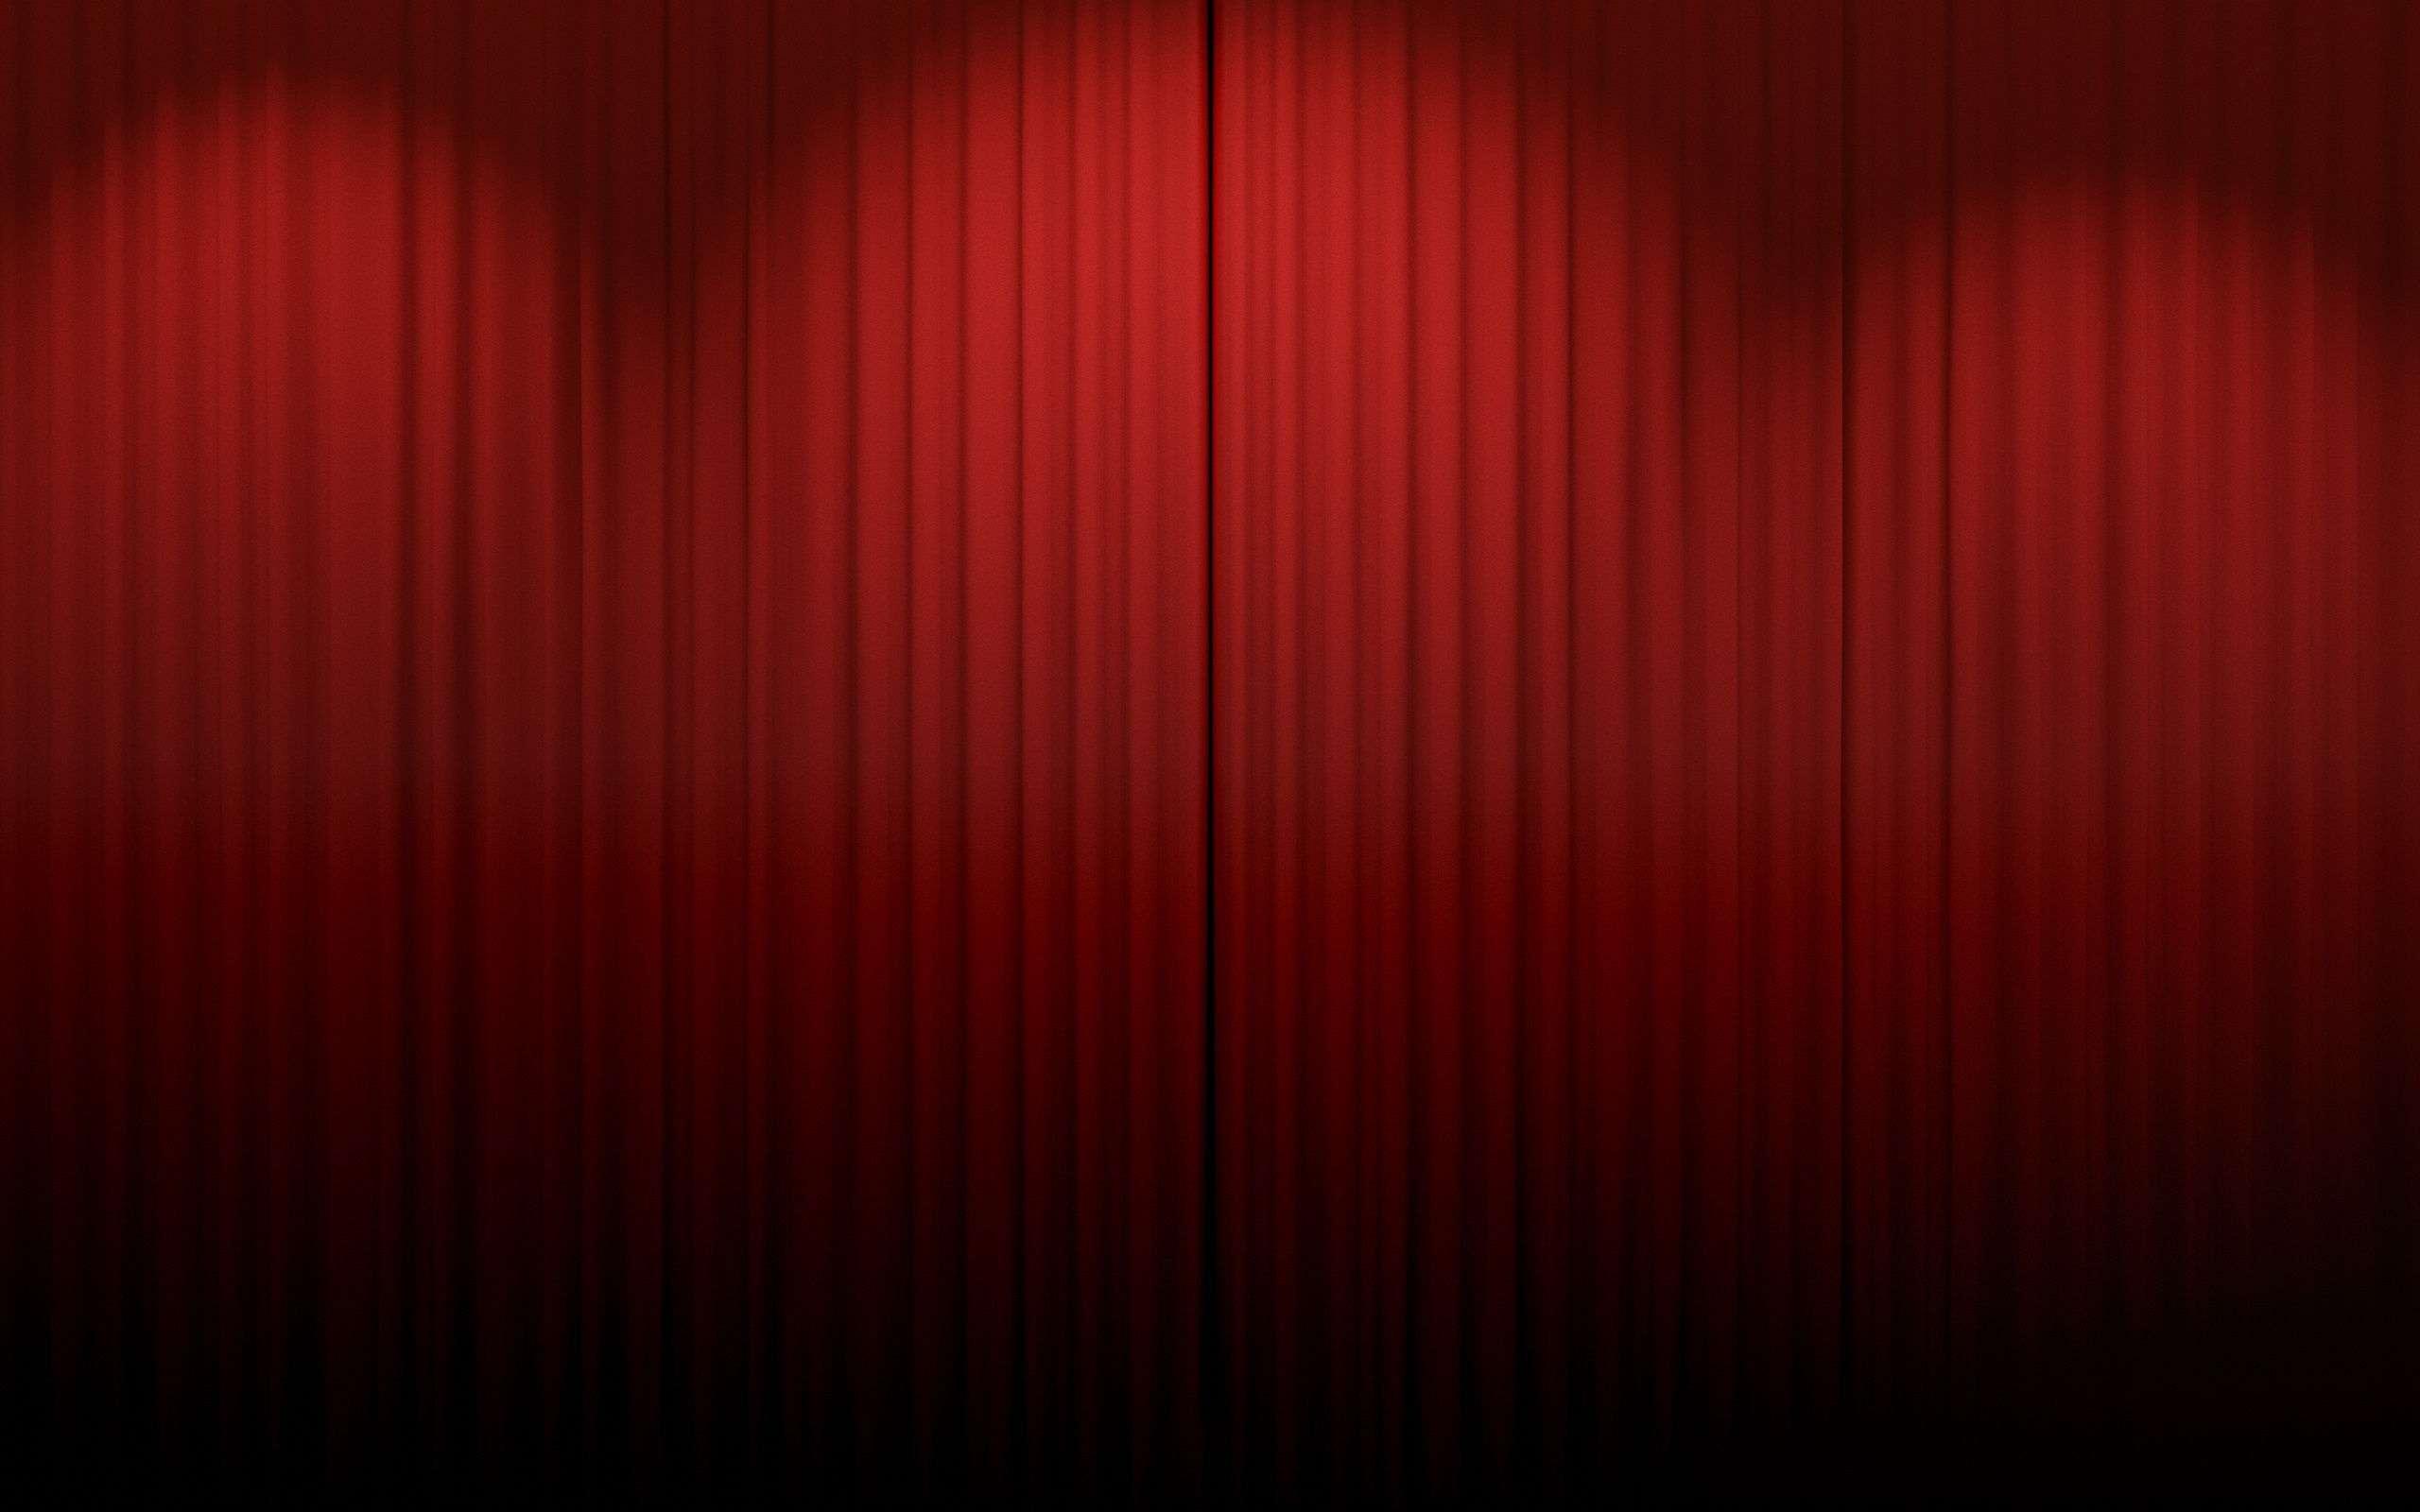 Red Wallpaper 049